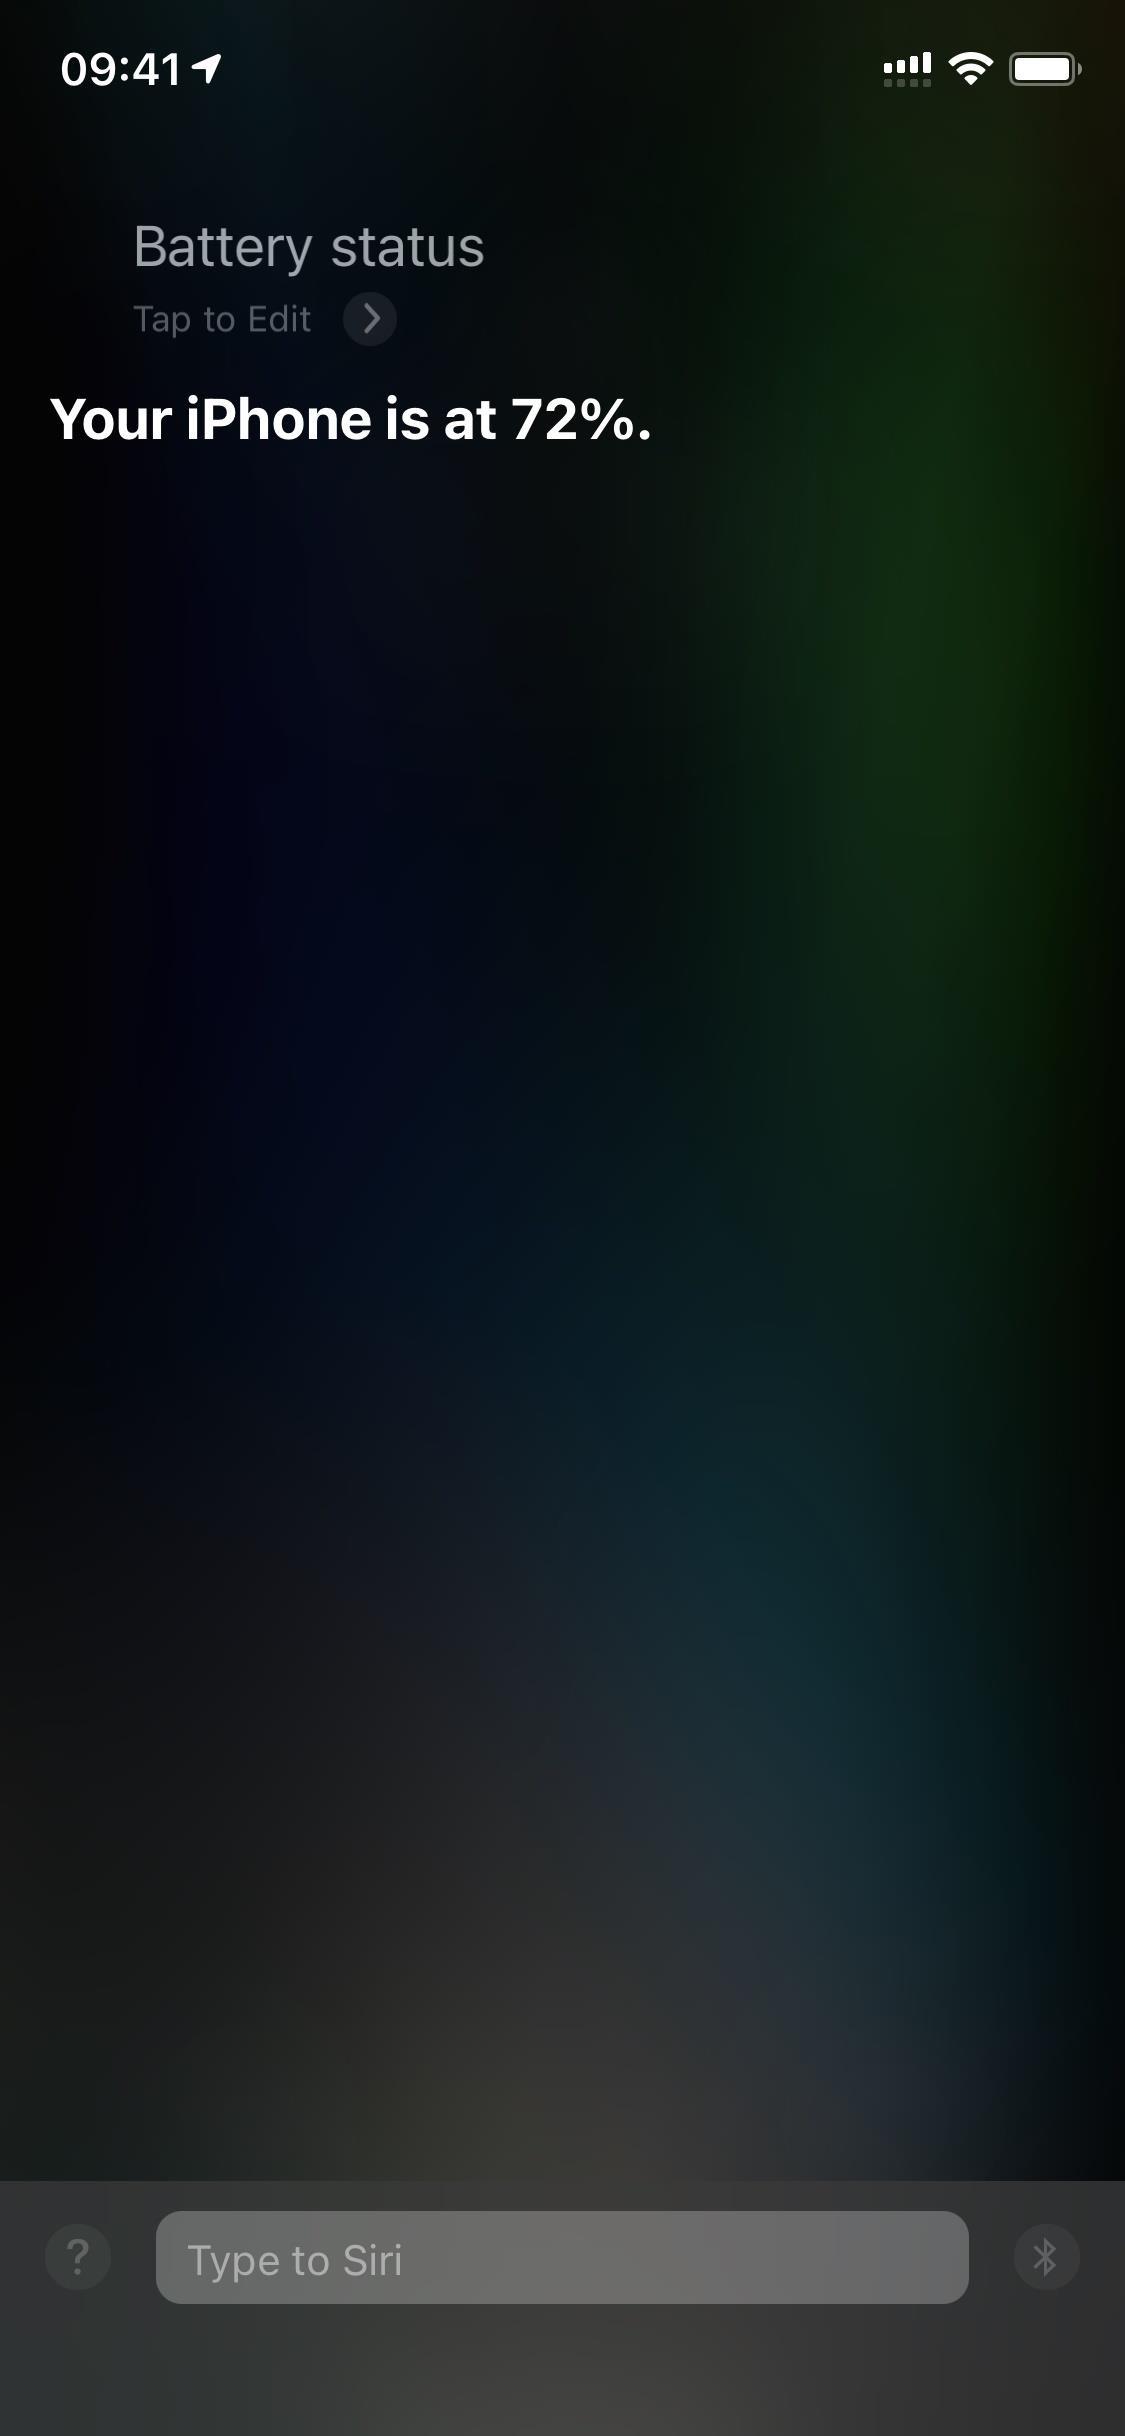 ask siri iphone battery percentage